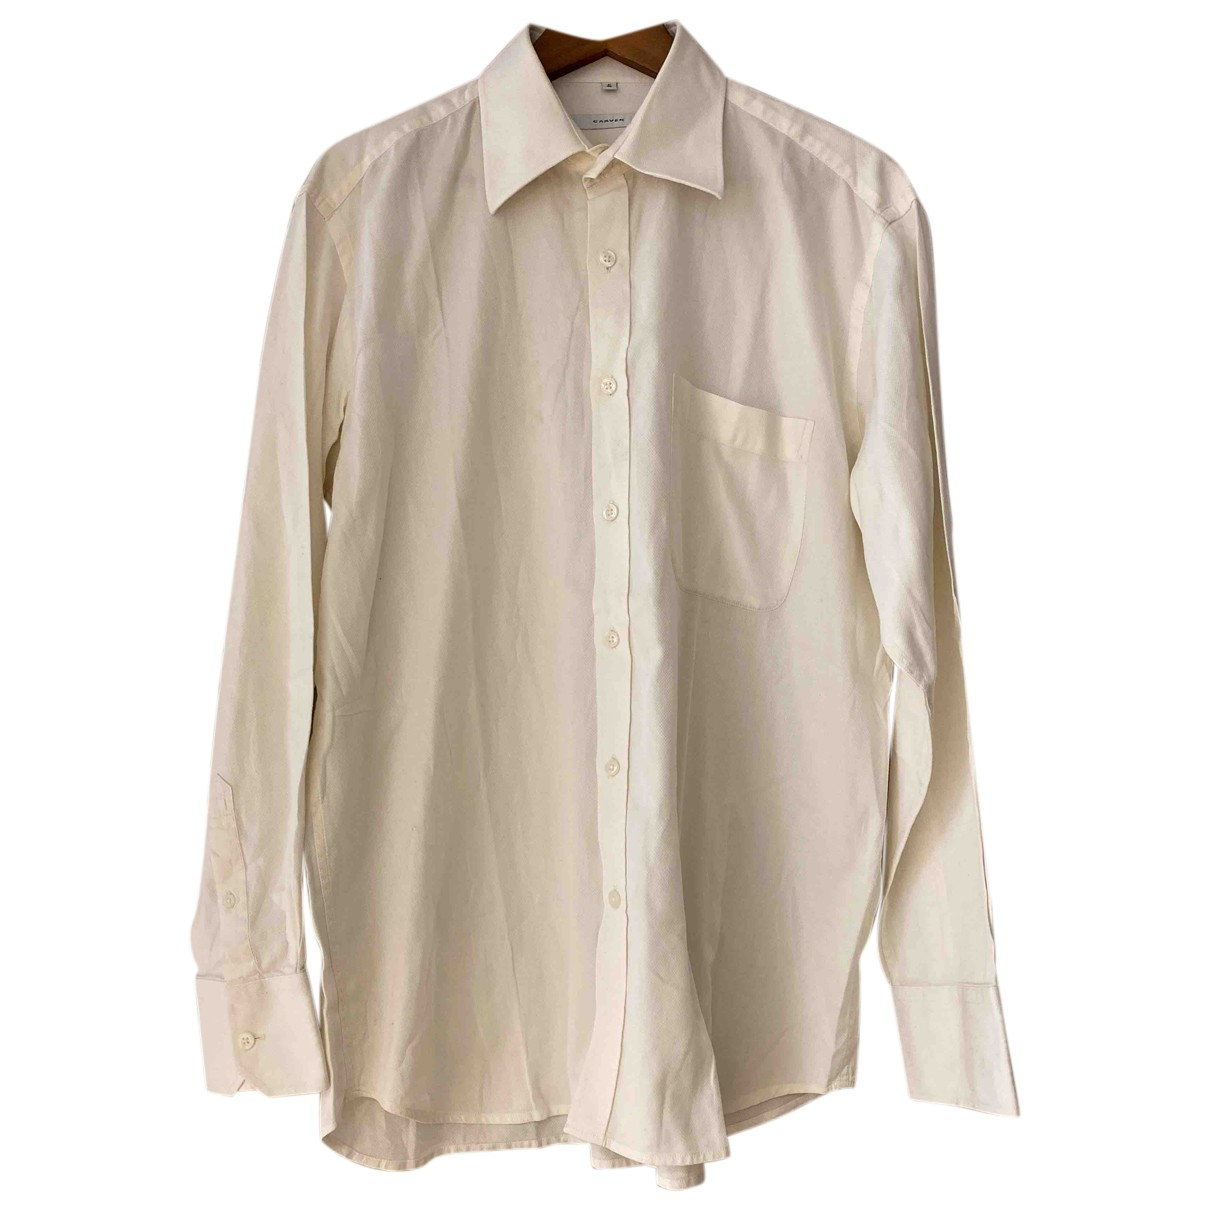 Carven N Ecru Cotton Shirts for Men 41 EU (tour de cou / collar)